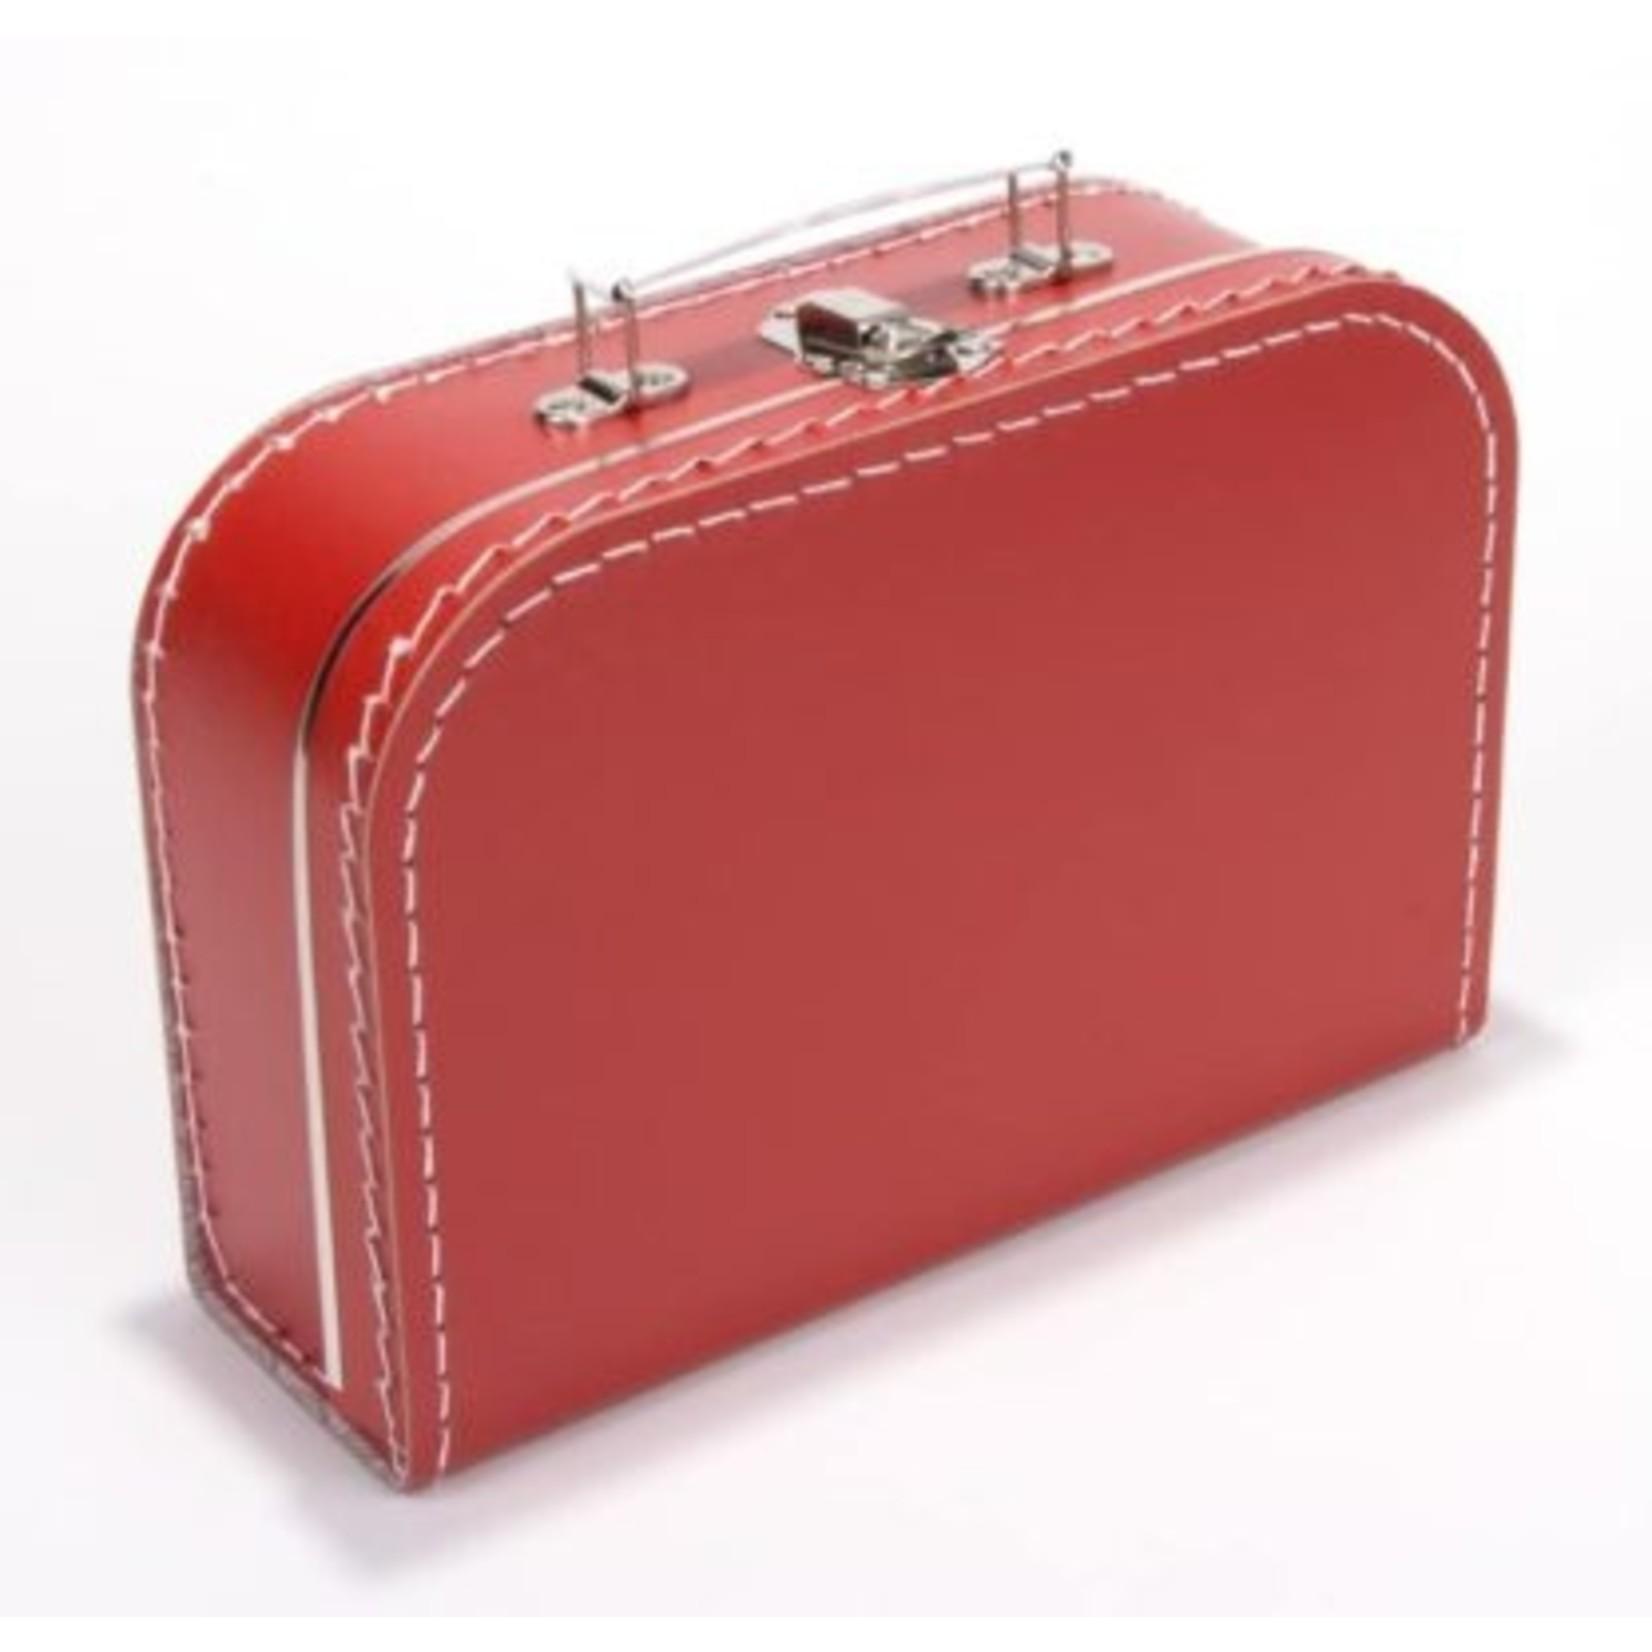 Kinderkoffertje 25cm met naam en/of figuurtje rood